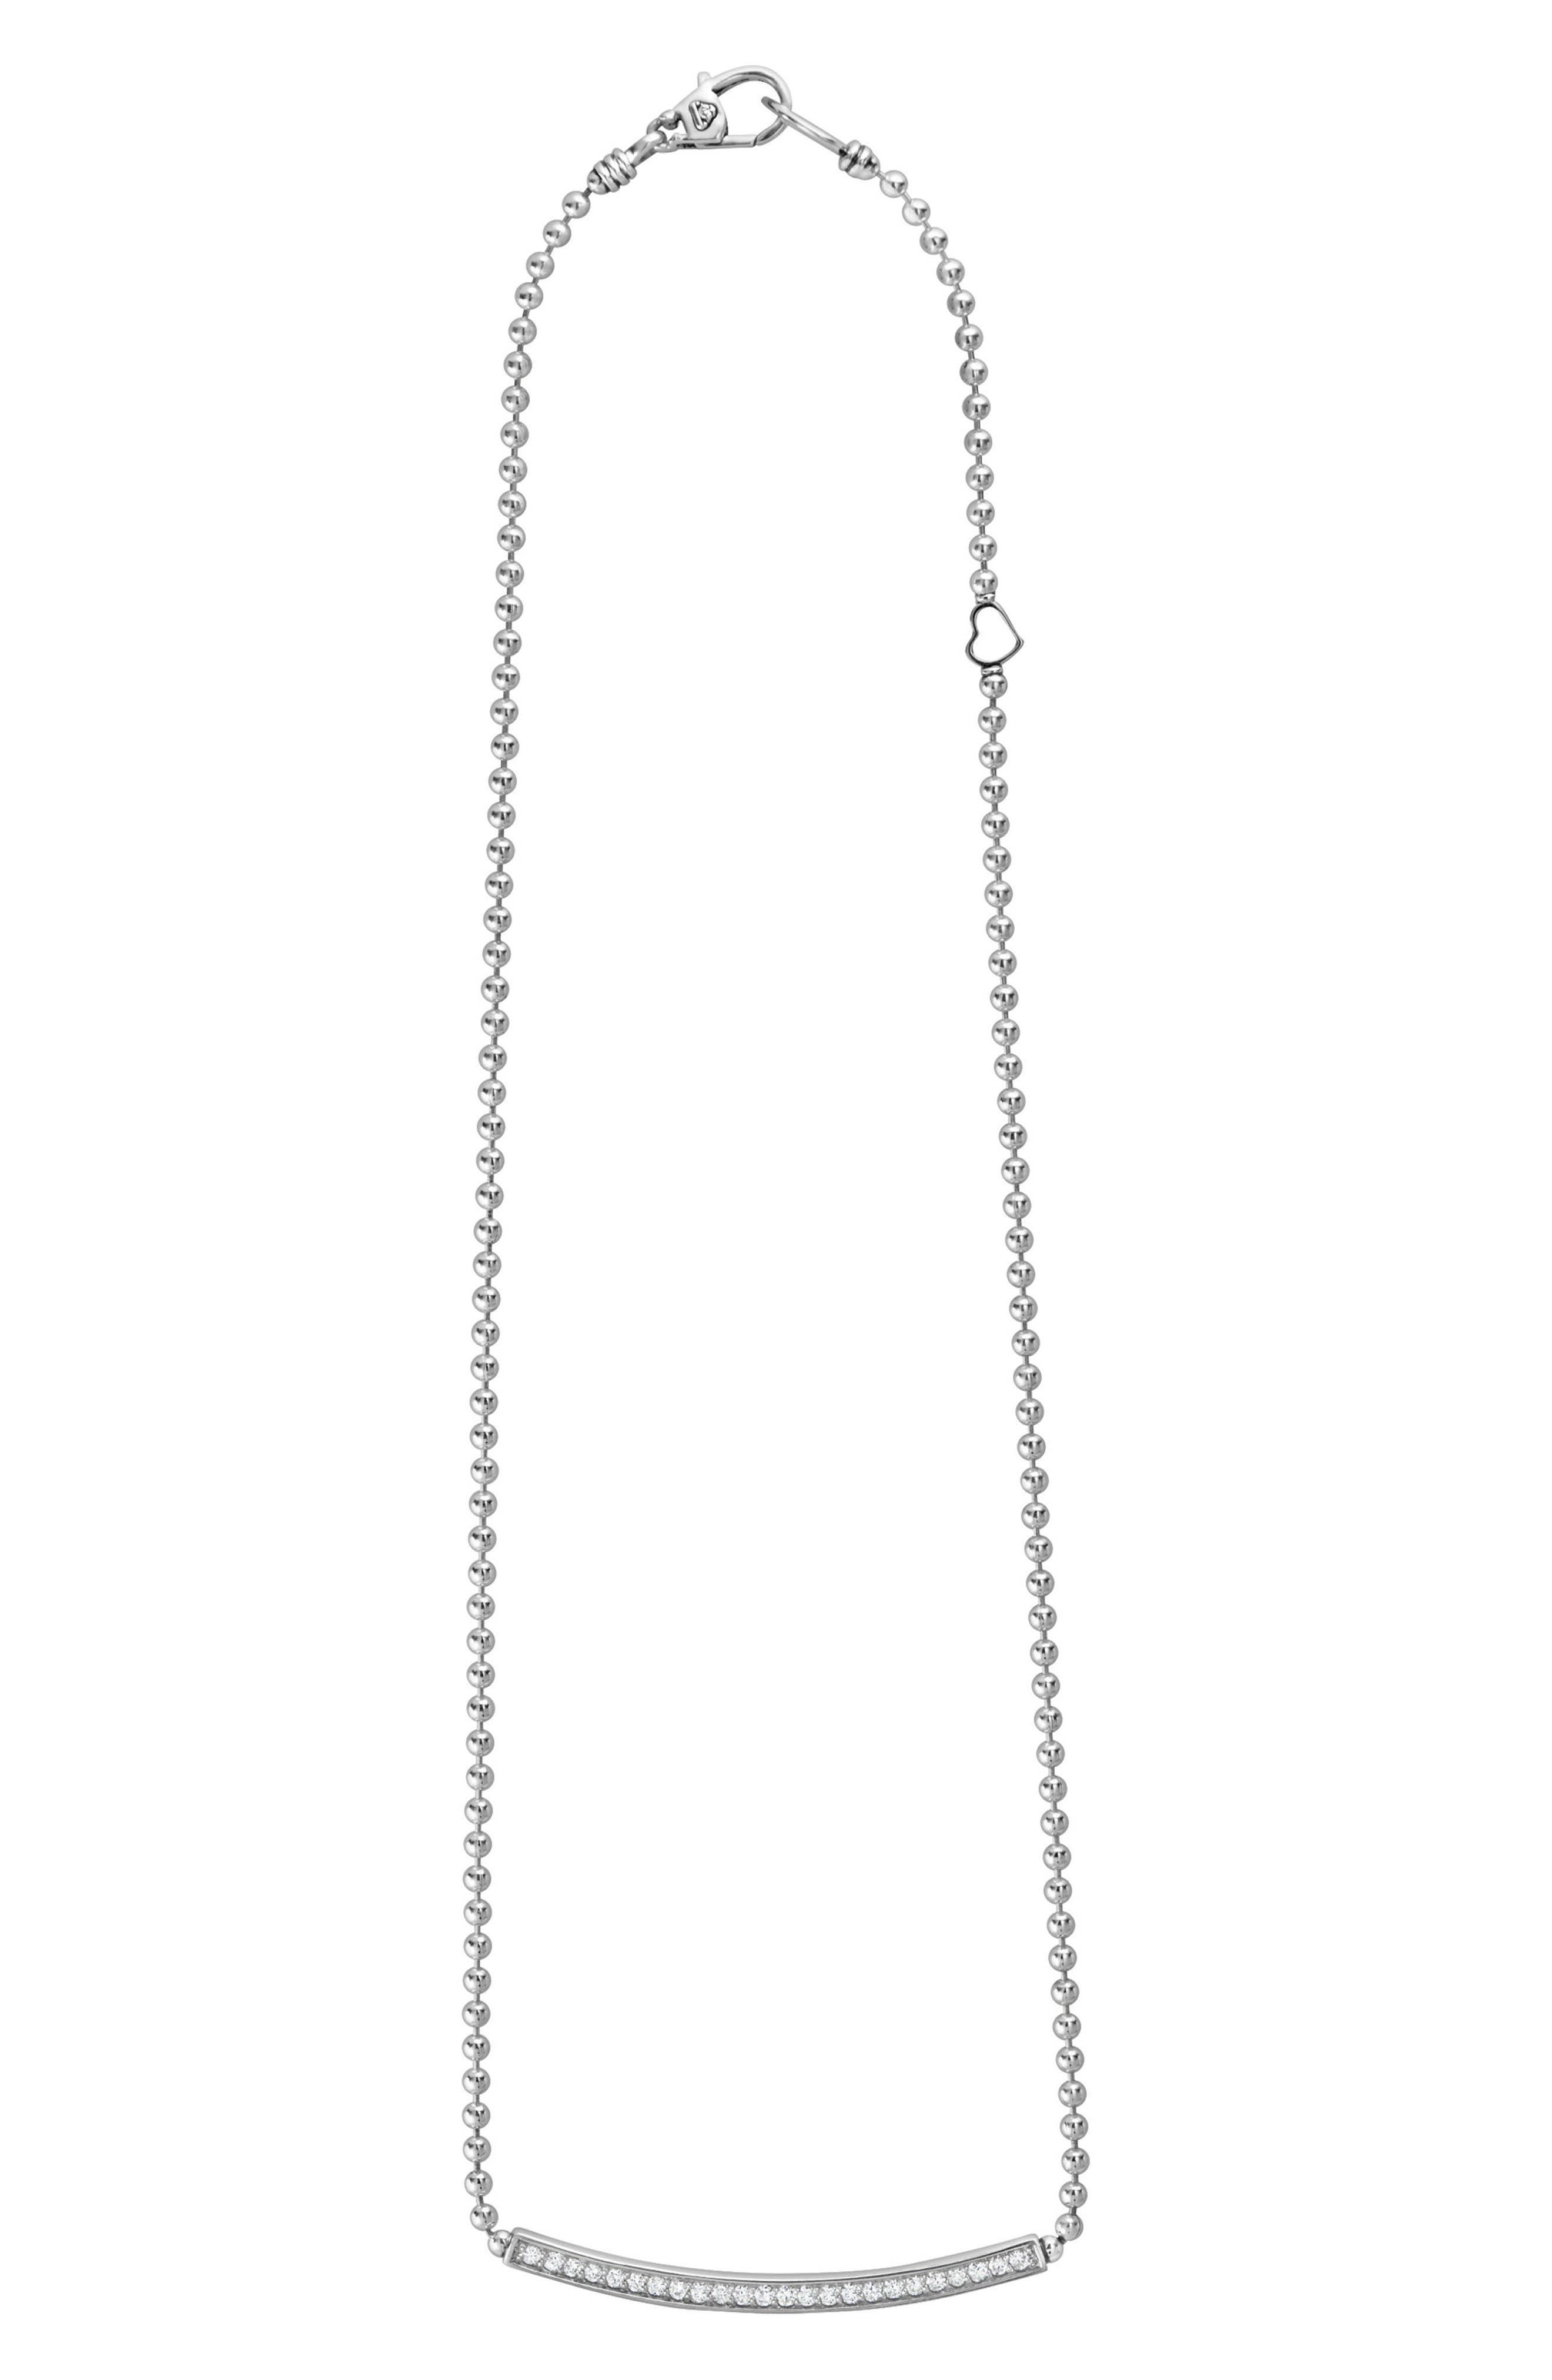 Caviar Spark Diamond Bar Necklace,                         Main,                         color, SILVER/ DIAMOND